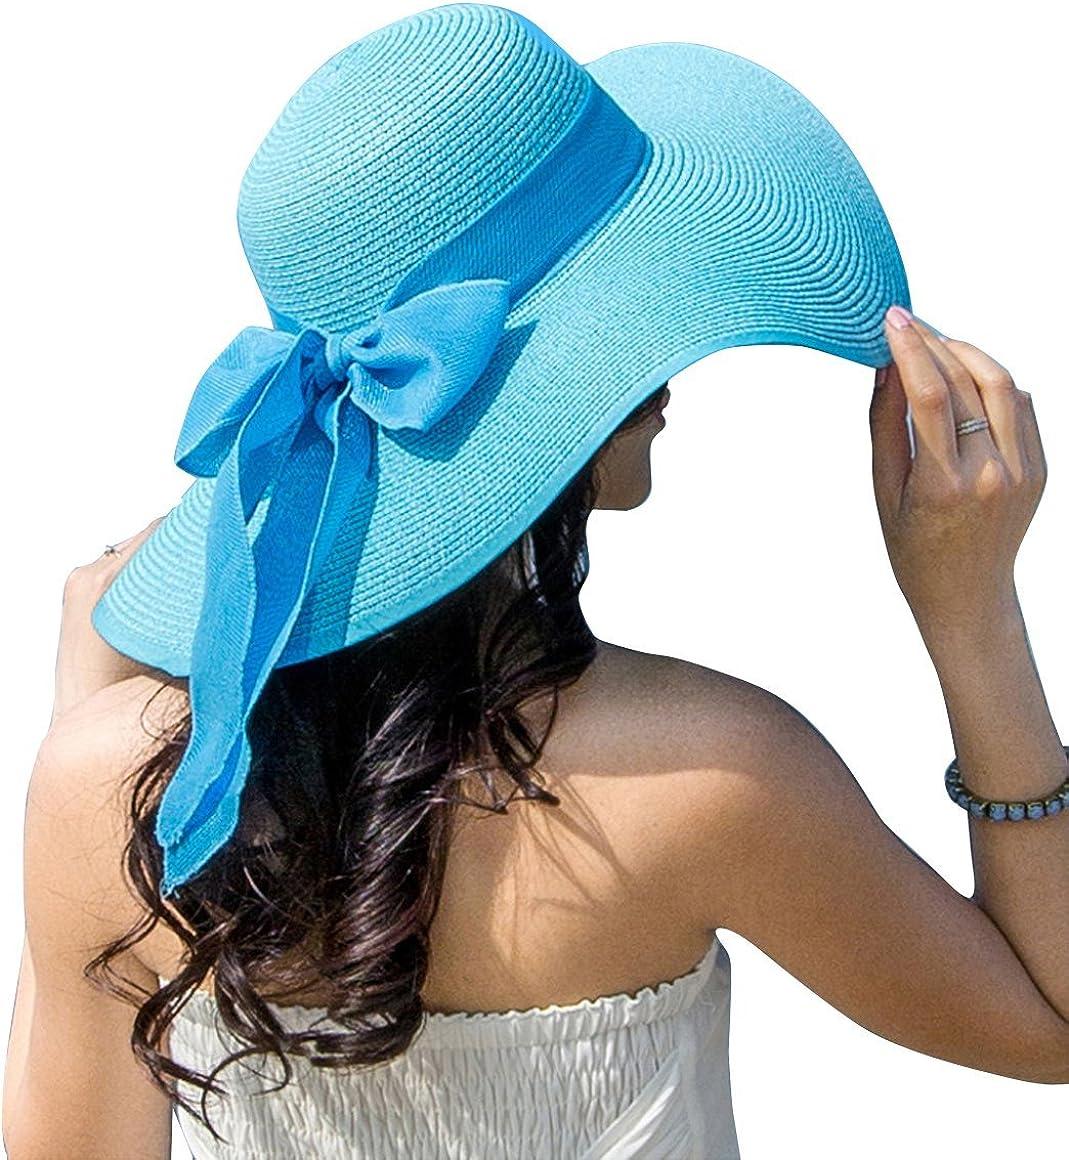 Linen sun hat lady Summer suns hats Floppy linen hats Travel womens hats Cloche summer hats Brimmed hats women Fashion summer hats